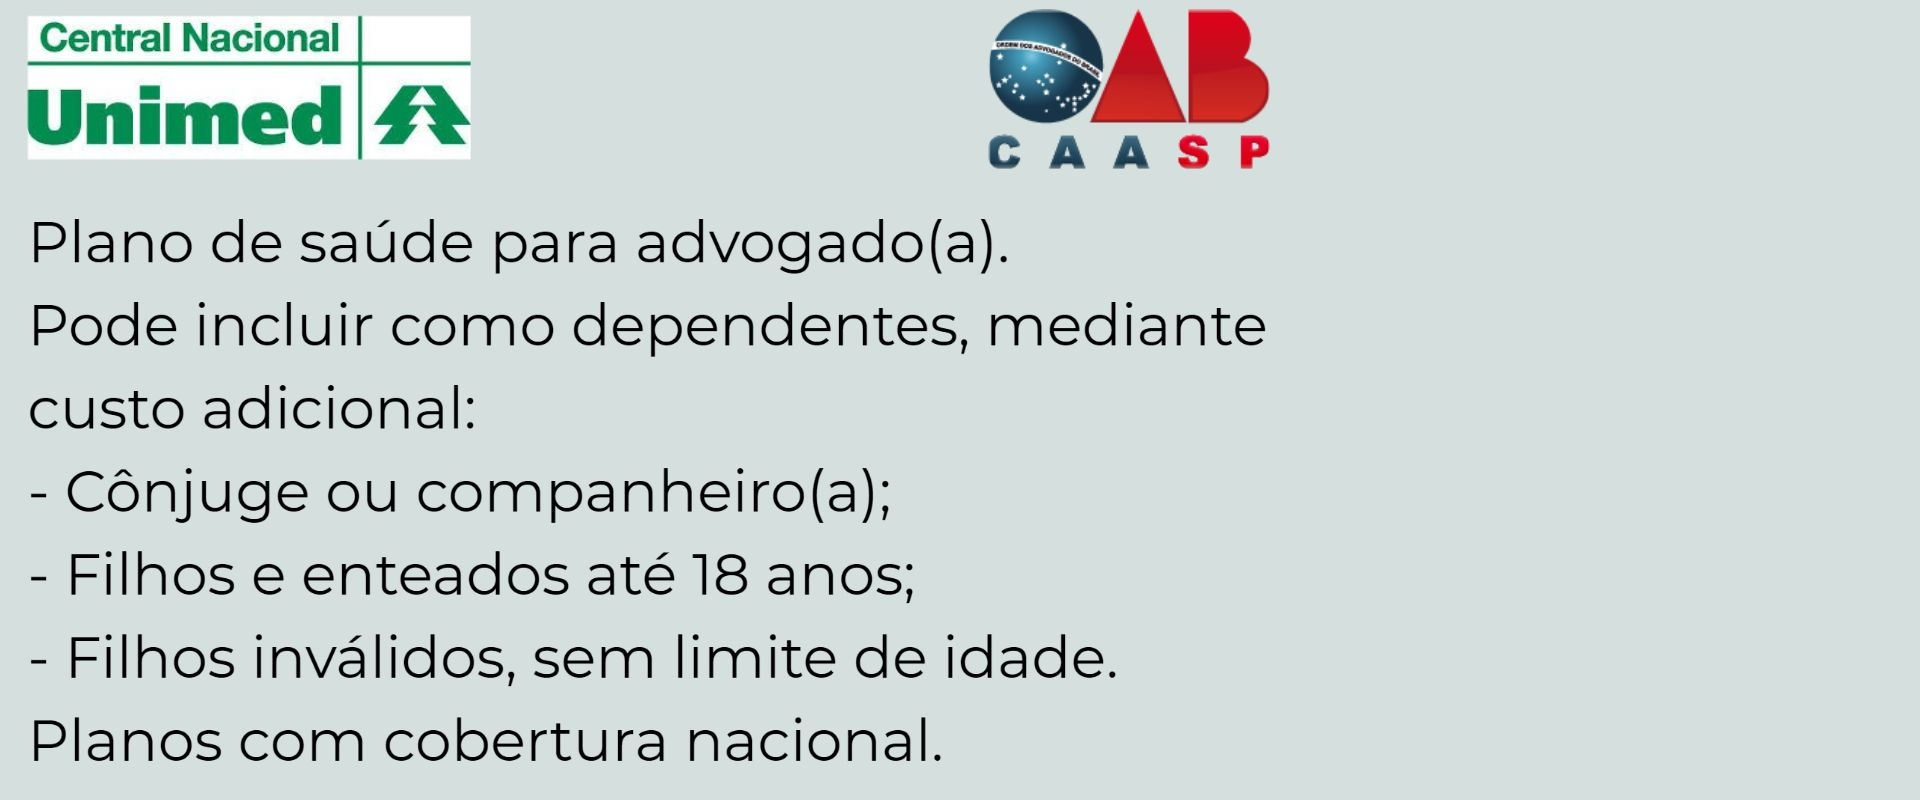 Unimed CAASP Araraquara